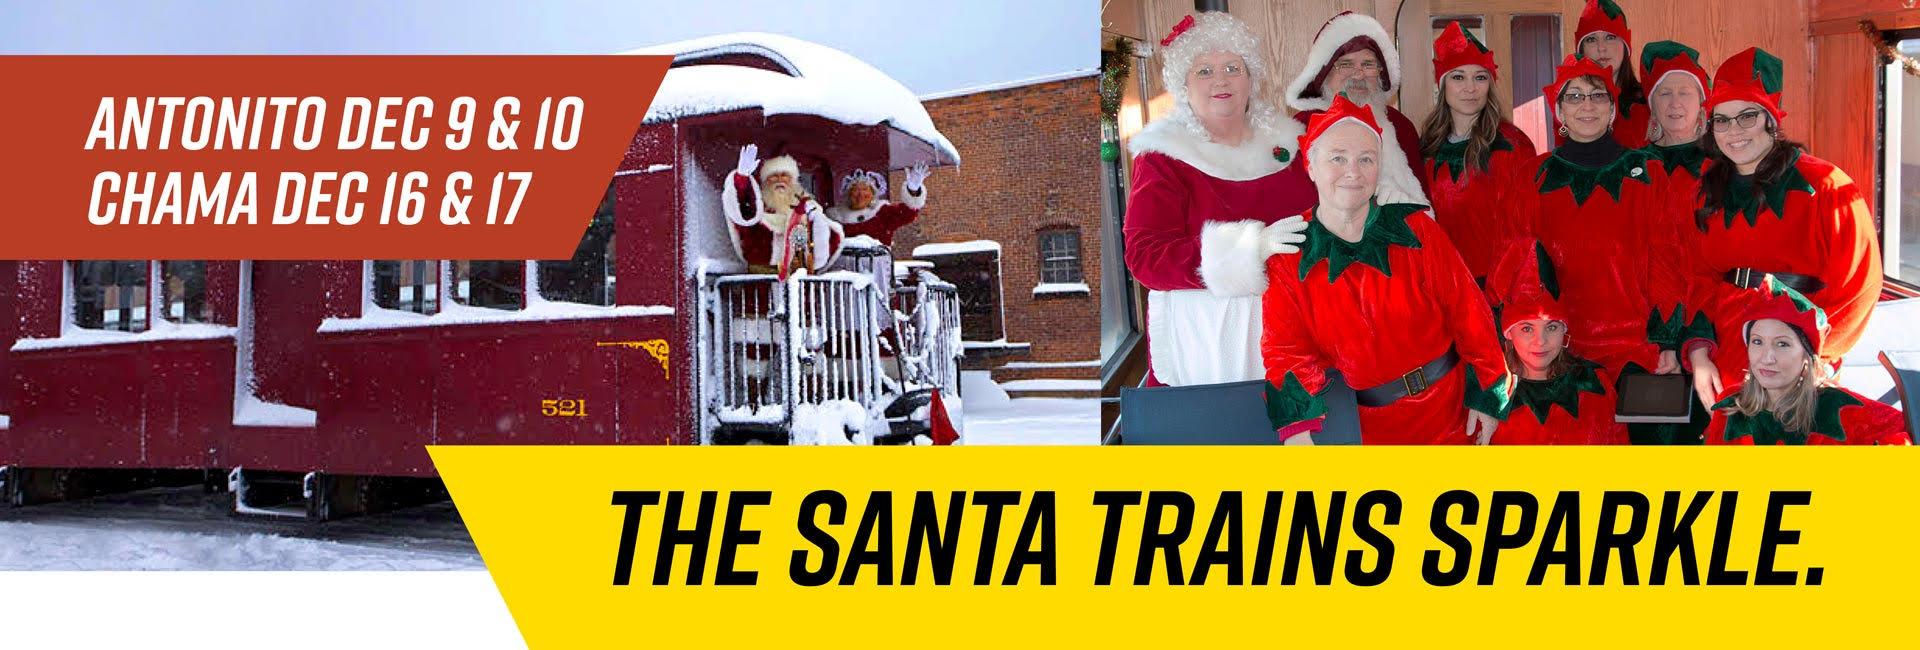 Slider #1 Santa Trains Sparkle